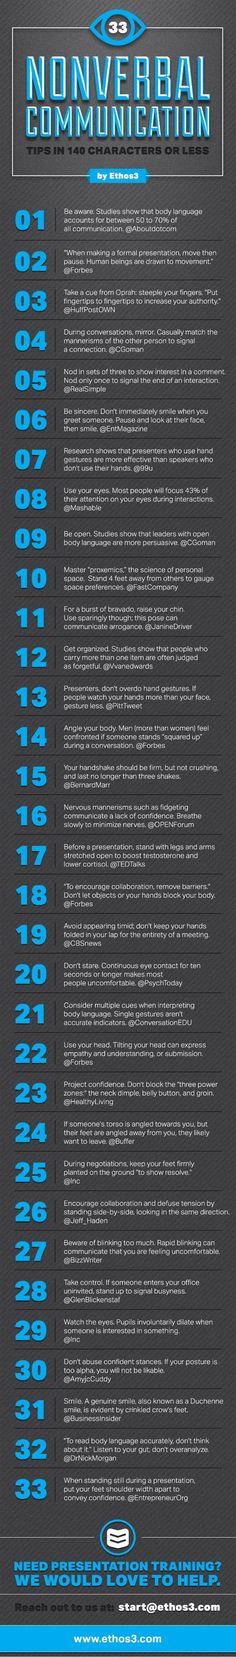 Psychology : Psychology : 33 consejos sobre comunicación no verbal en 140 caracteres